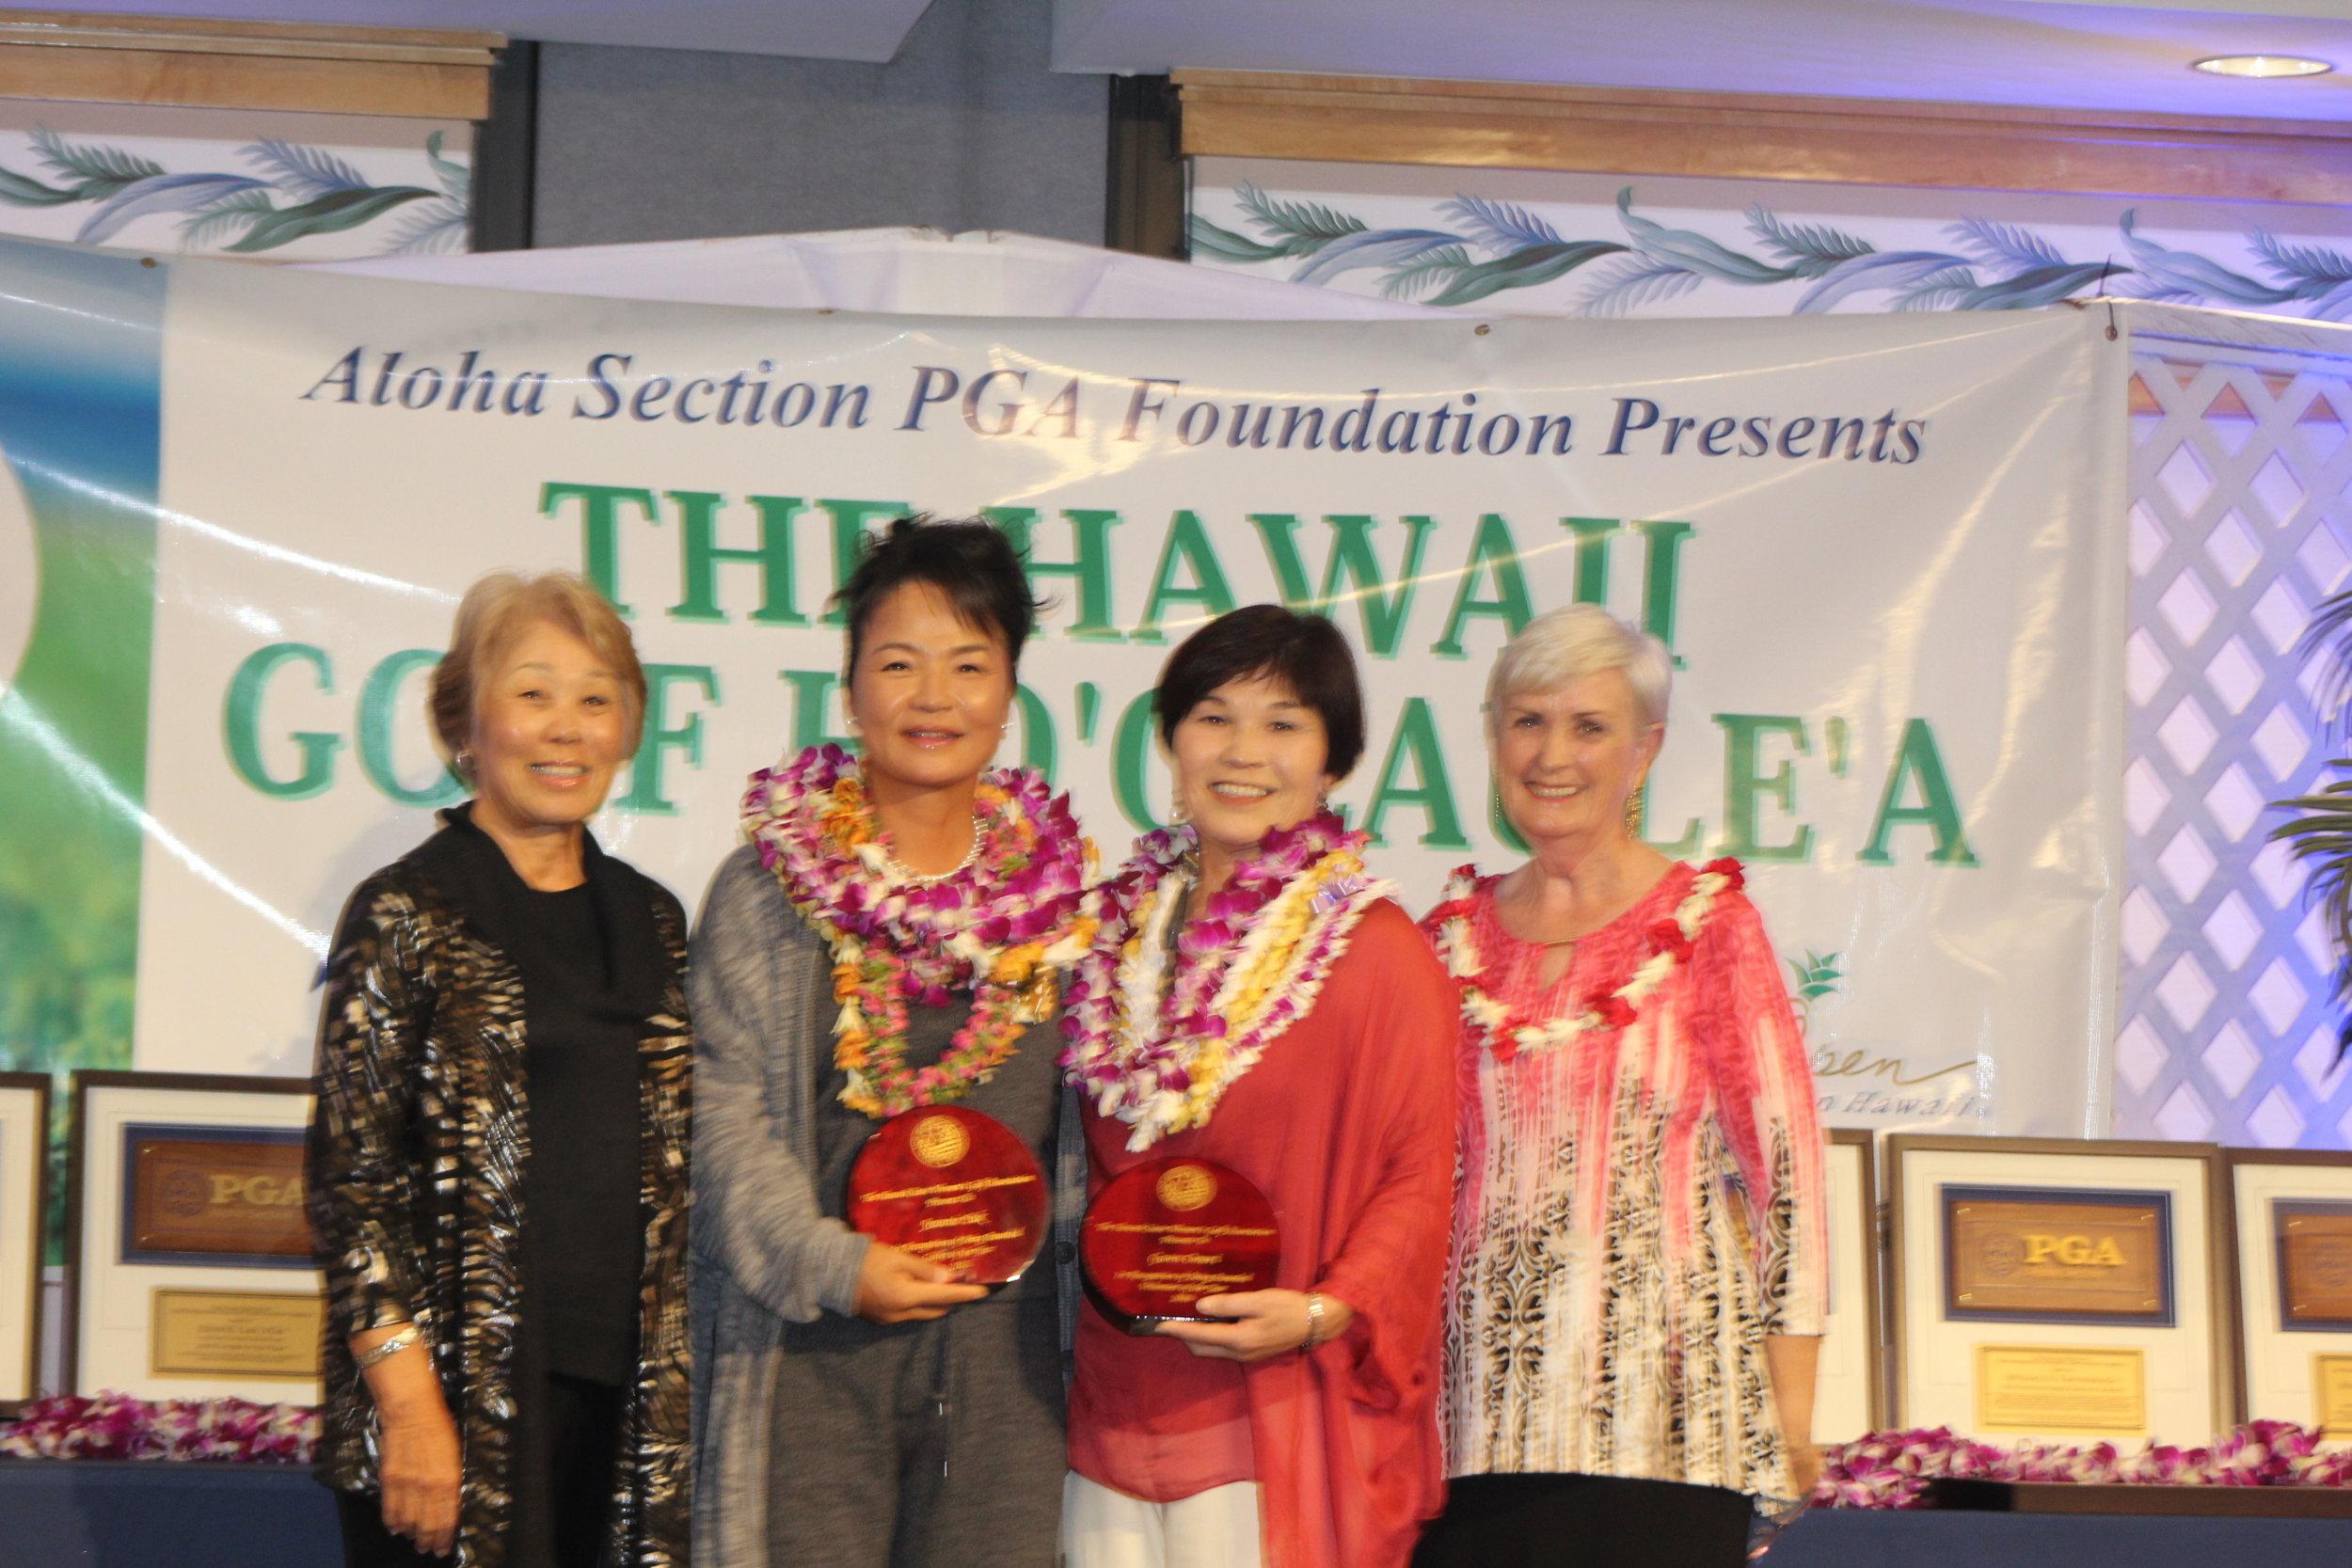 Susan Church (HSWGA VP), Jeannie Pak, Gwen Omori, Barbara Schroeder (HSWGA Pres.)